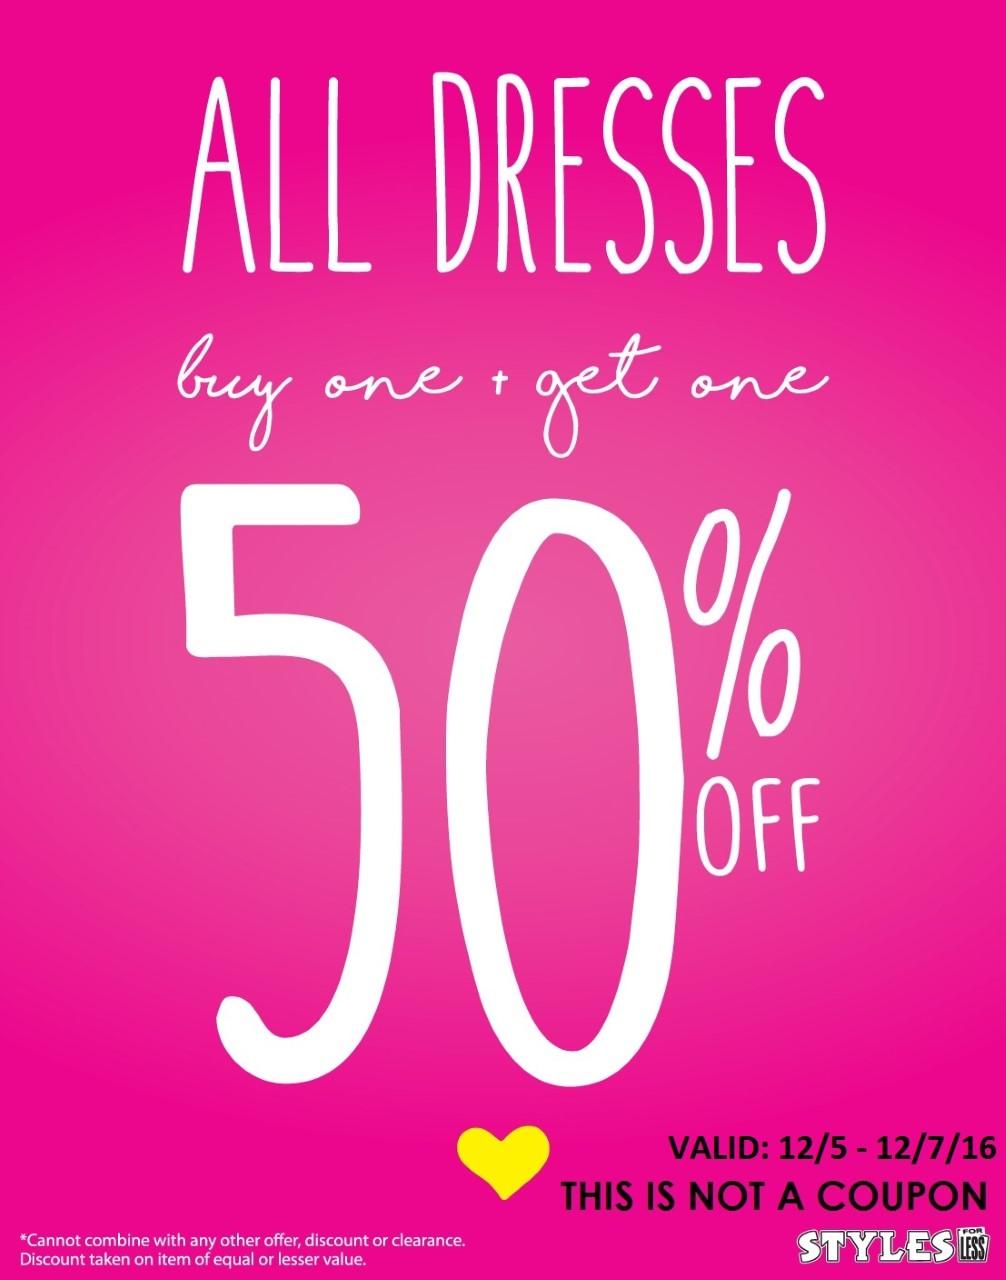 thumbnail_SFL - Dresses B1G1 50%25 off